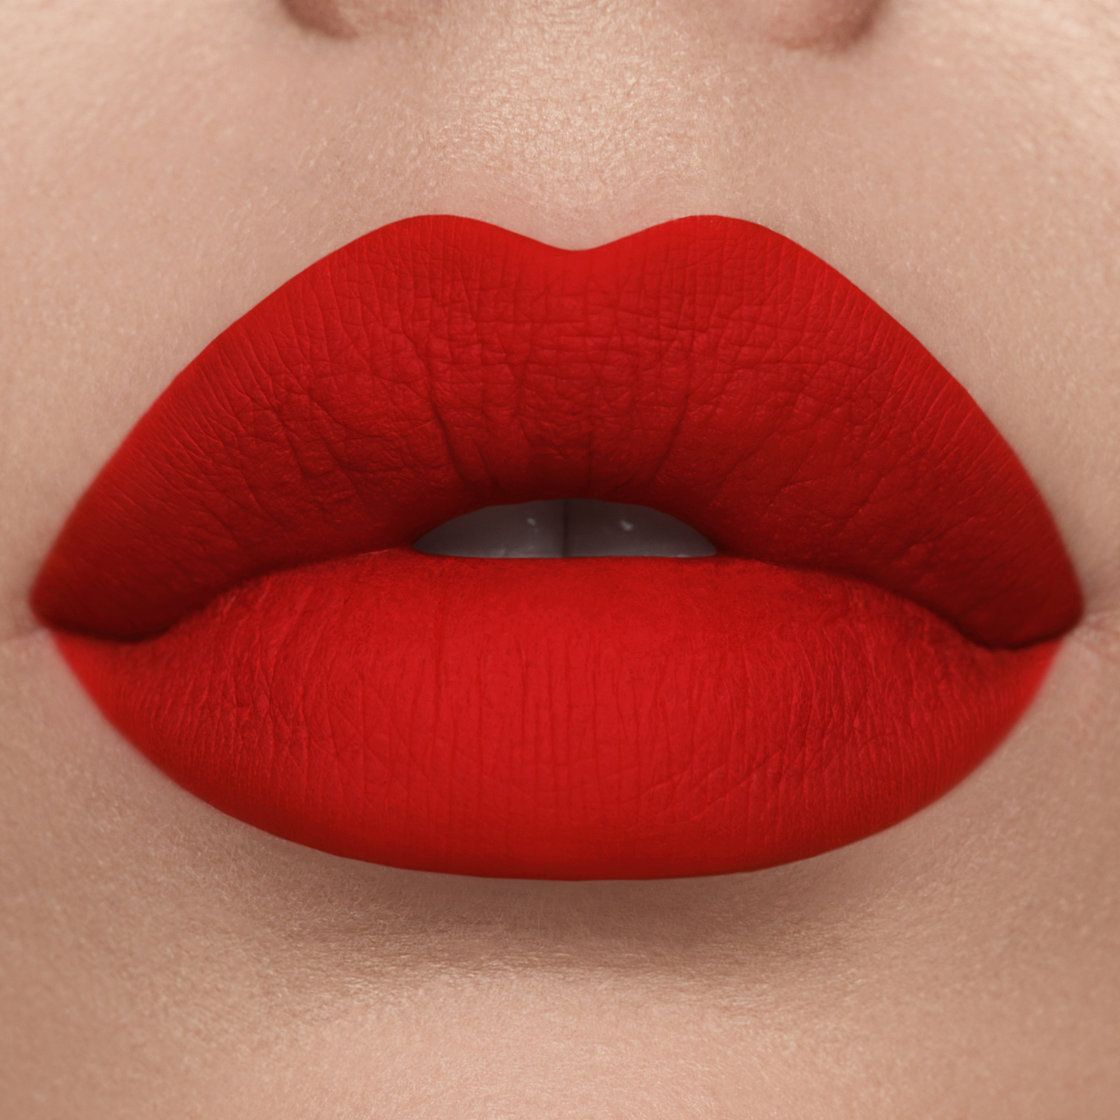 New Americana Matte Lipstick Flame Red Red Lipsticks Best